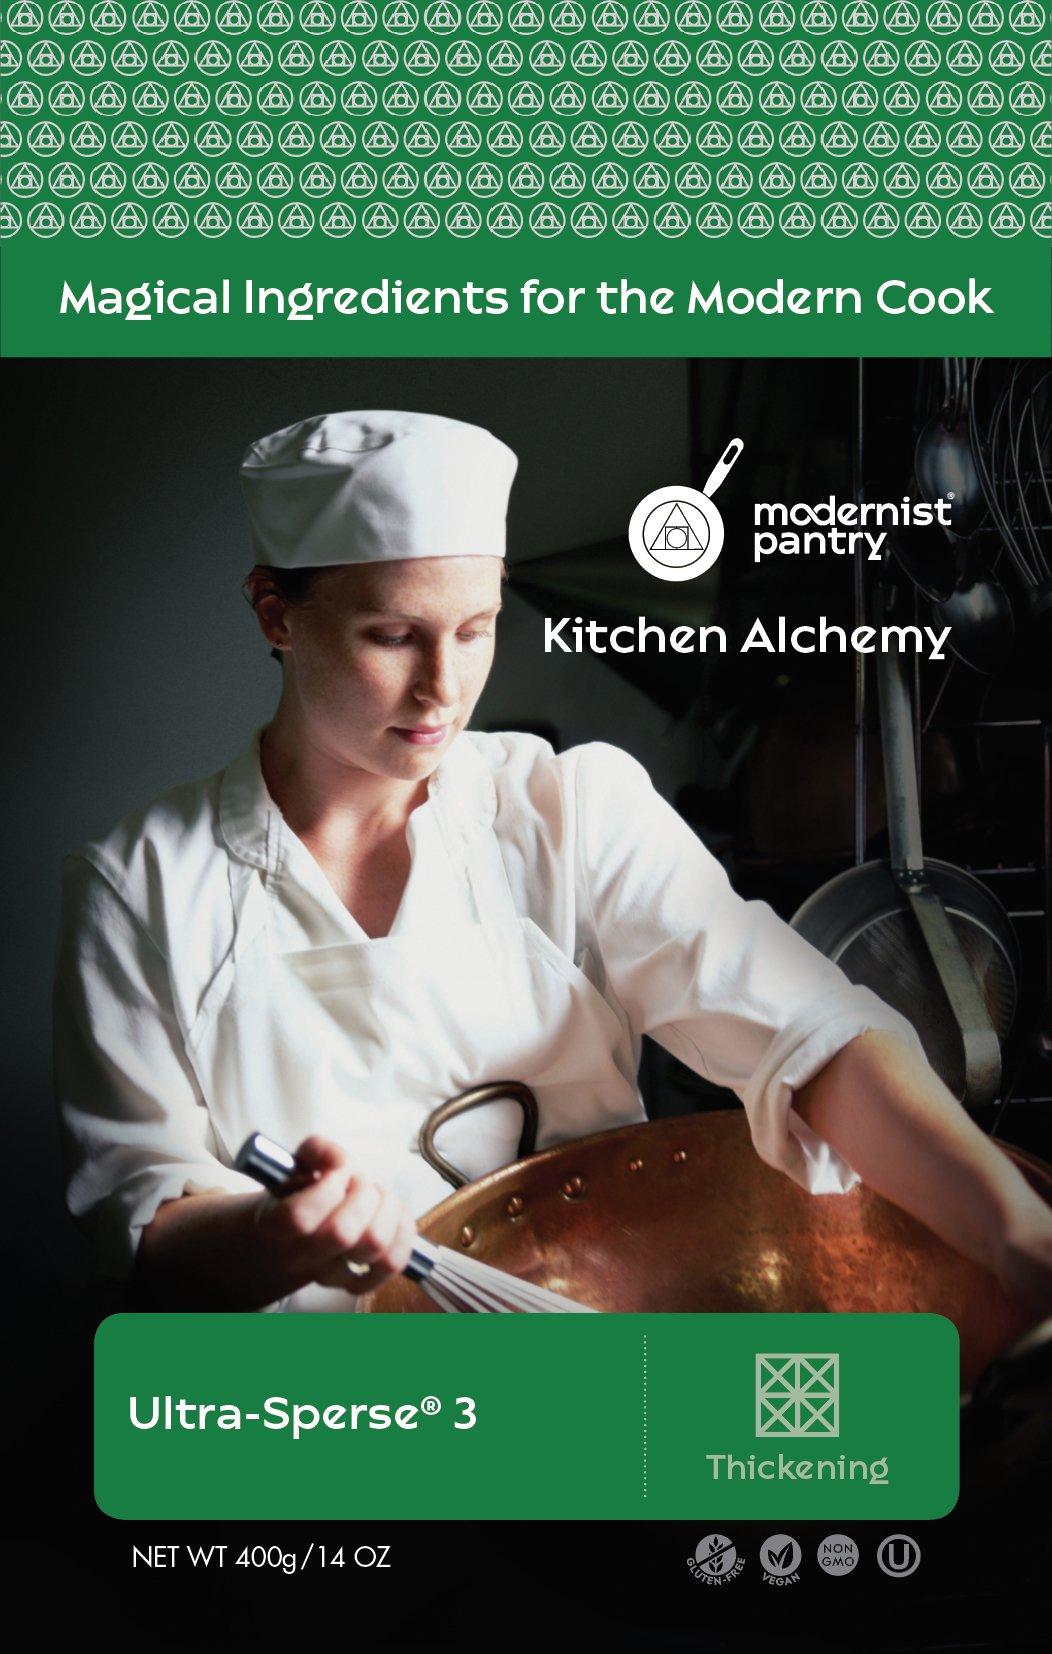 Food Grade Ultra-Sperse 3 (Molecular Gastronomy) ⊘ Non-GMO ☮ Vegan ✡ OU Kosher Certified - 400g/14oz